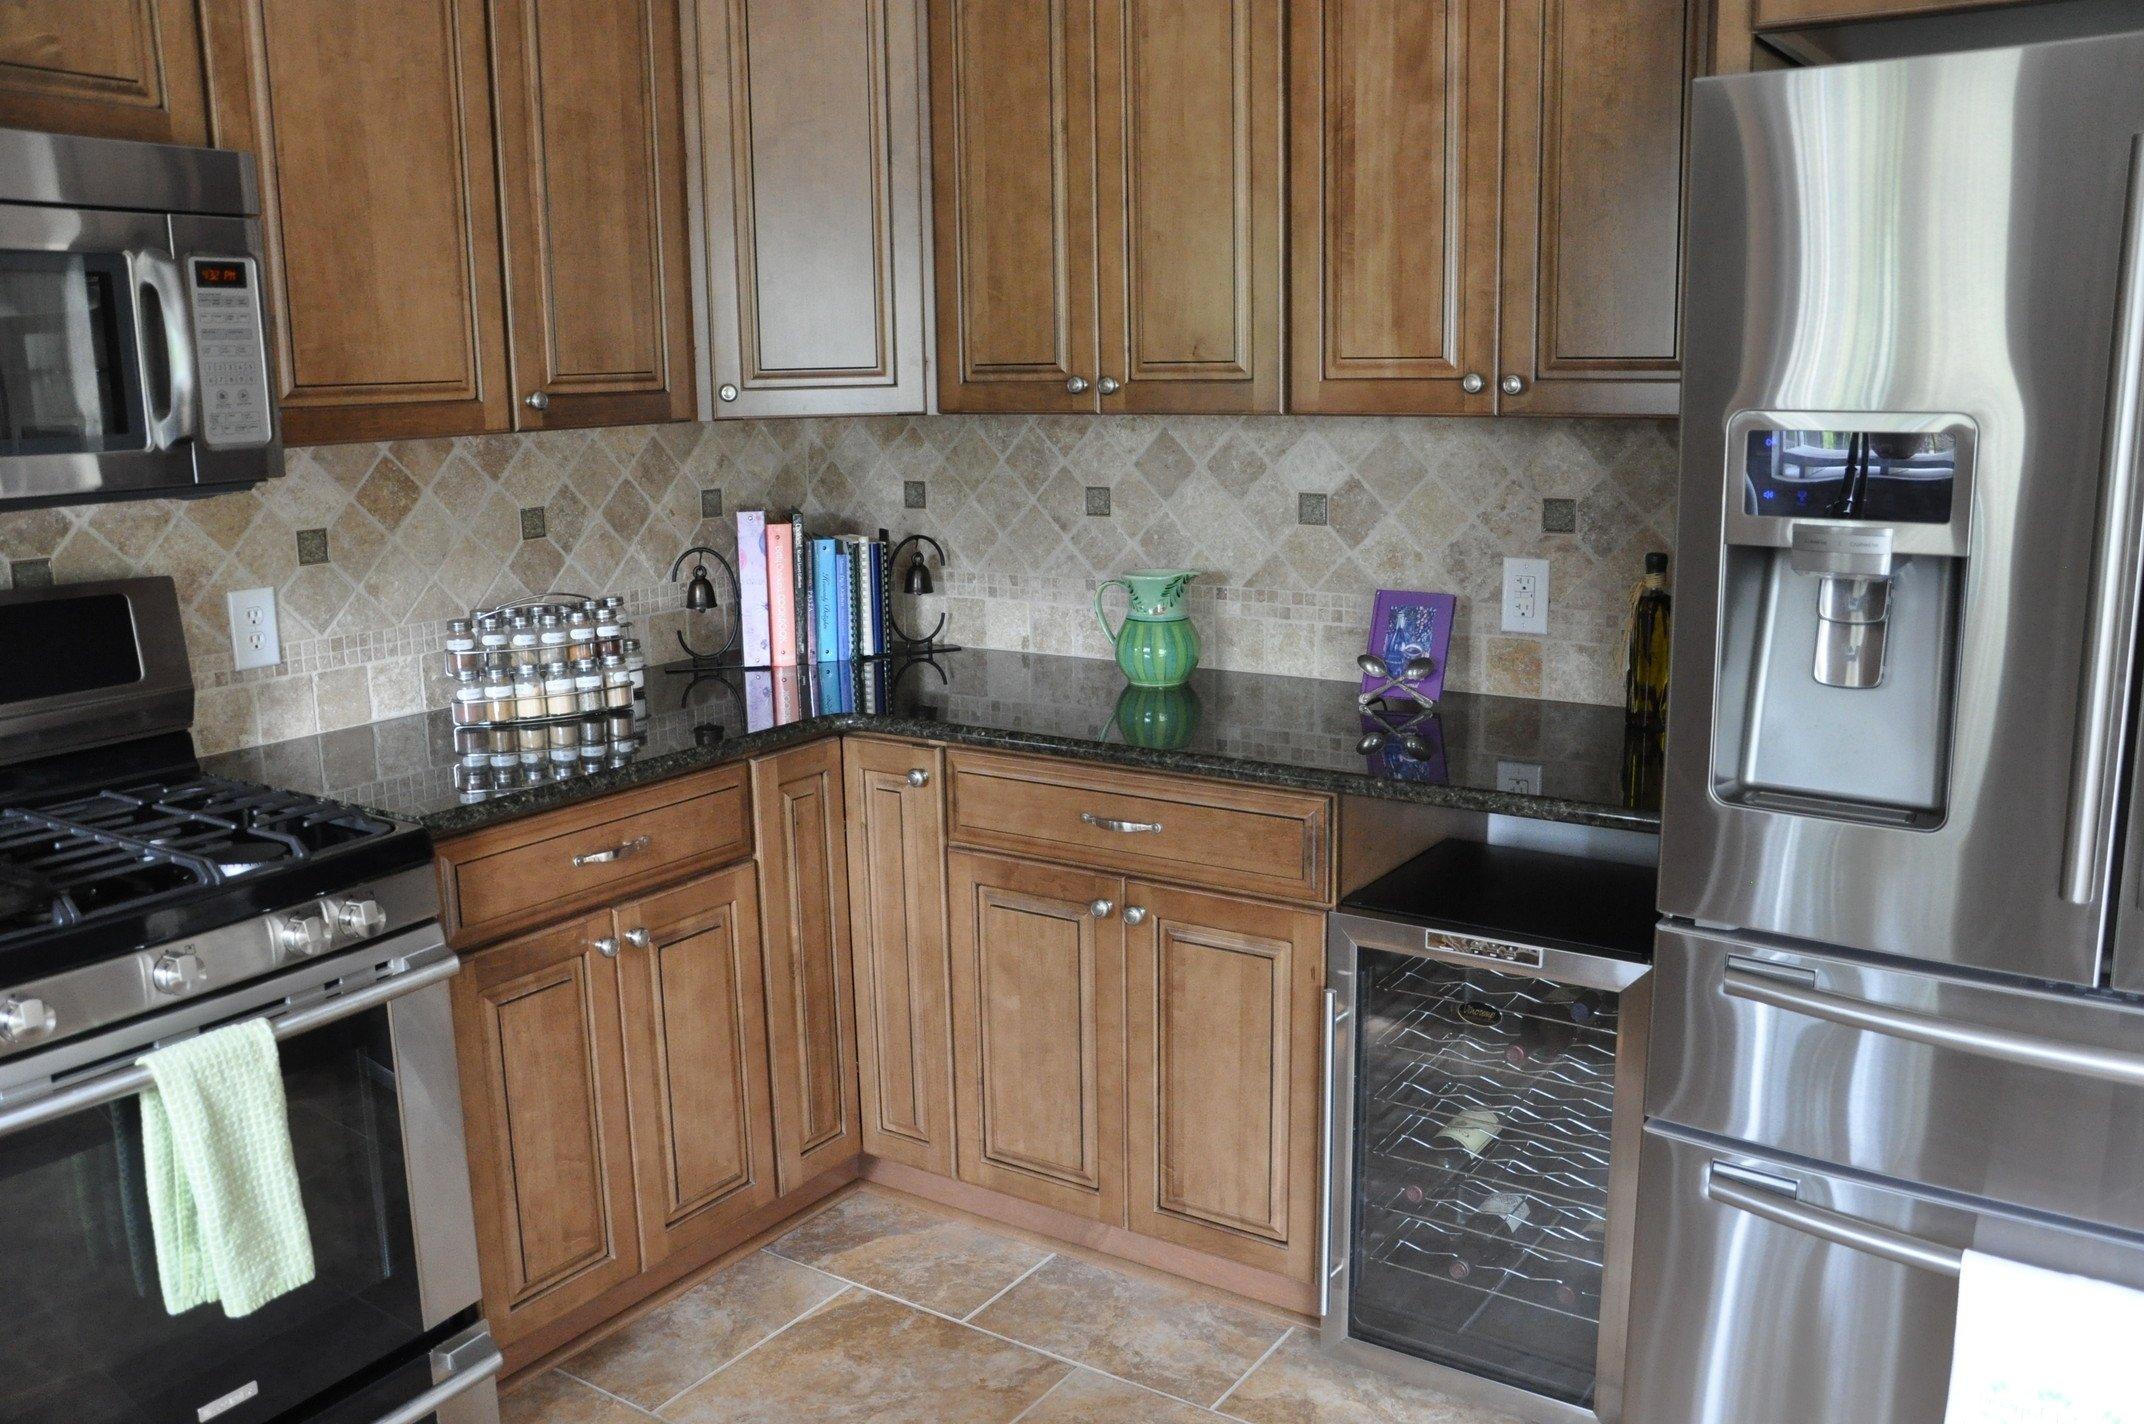 10 Fabulous Uba Tuba Granite Backsplash Ideas kitchen tile backsplash ideas with uba tuba granite countertops 2020